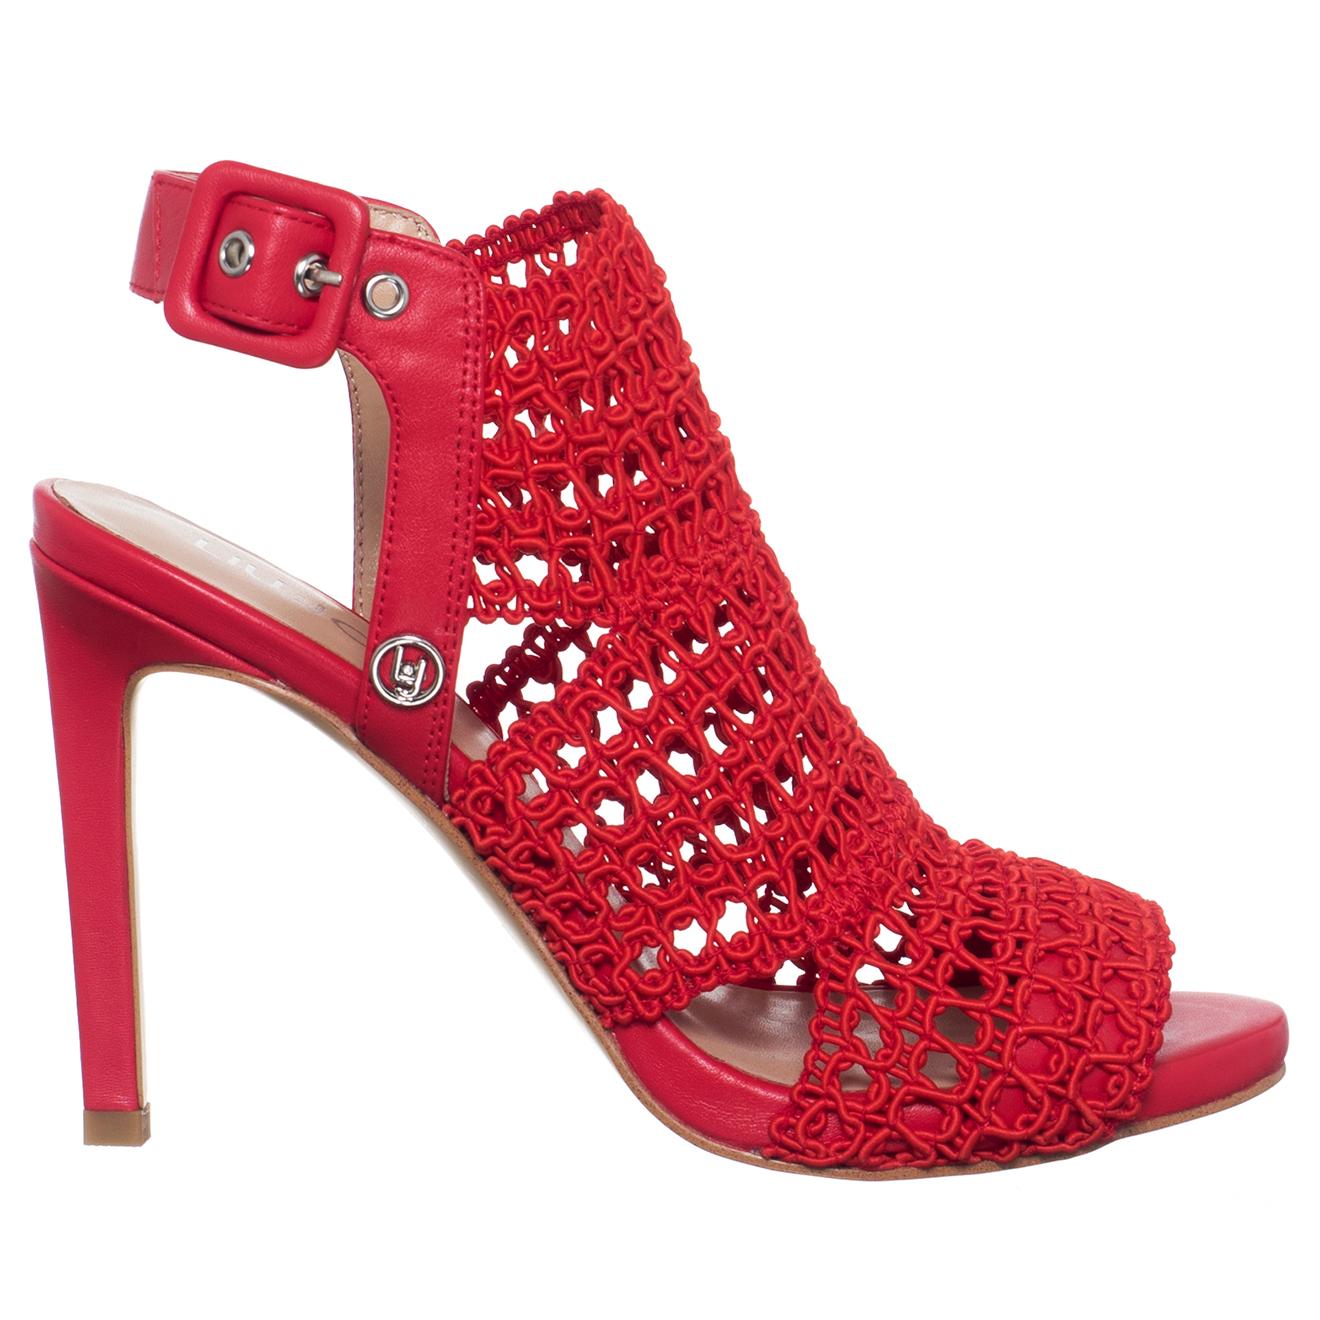 Sandales en Cuir & Textile Bloom rouges - Talon 10 cm - Liu-Jo - Modalova